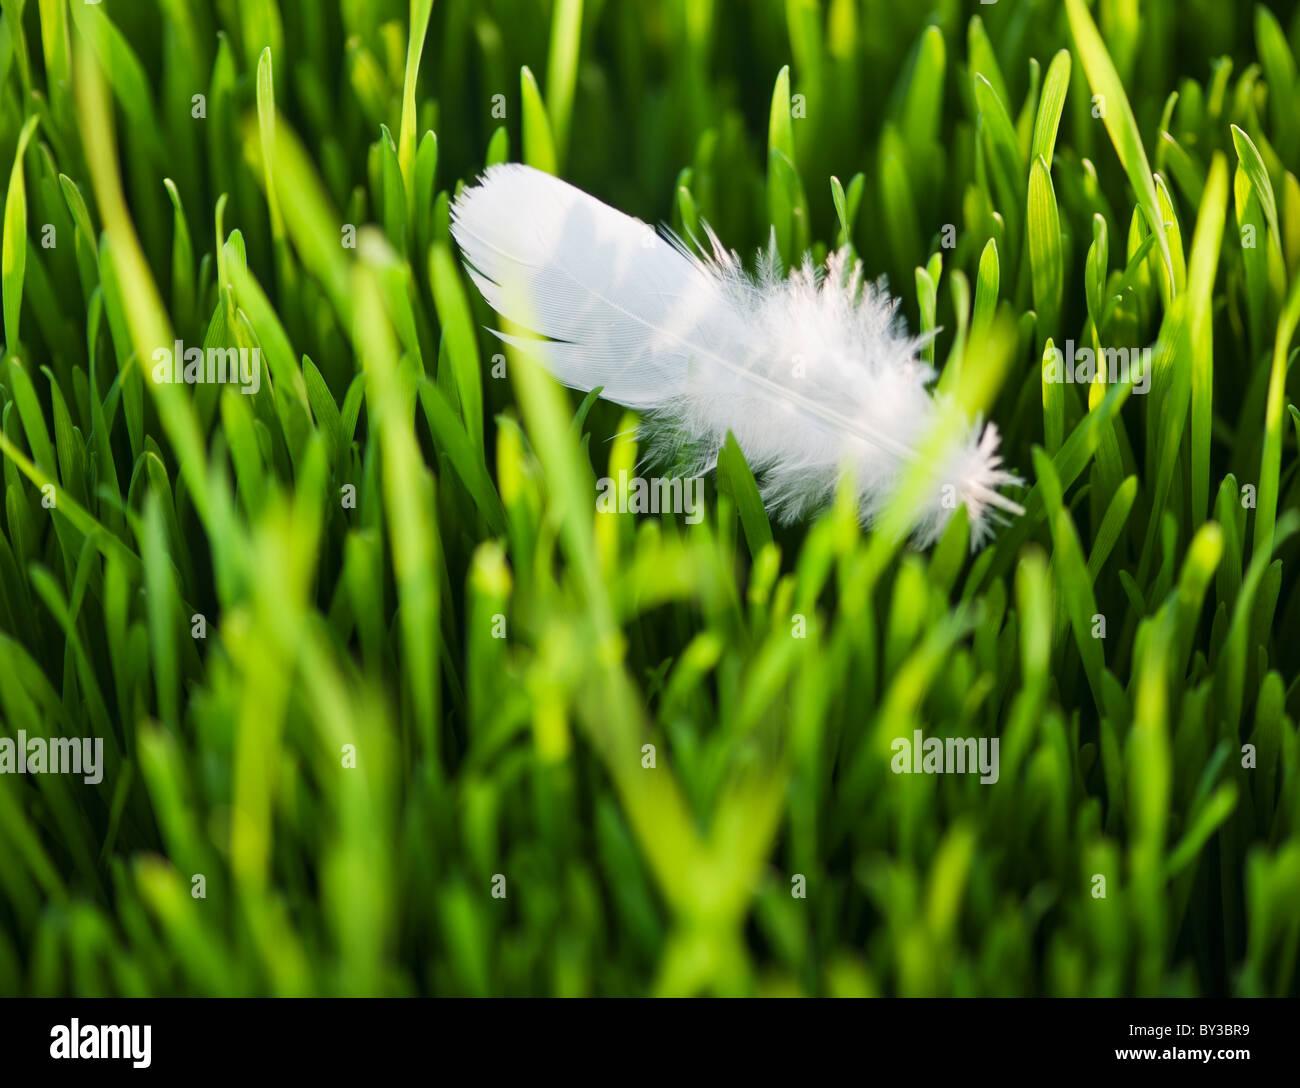 USA, New Jersey, Jersey City, Nahaufnahme des White Feather Gras Stockbild